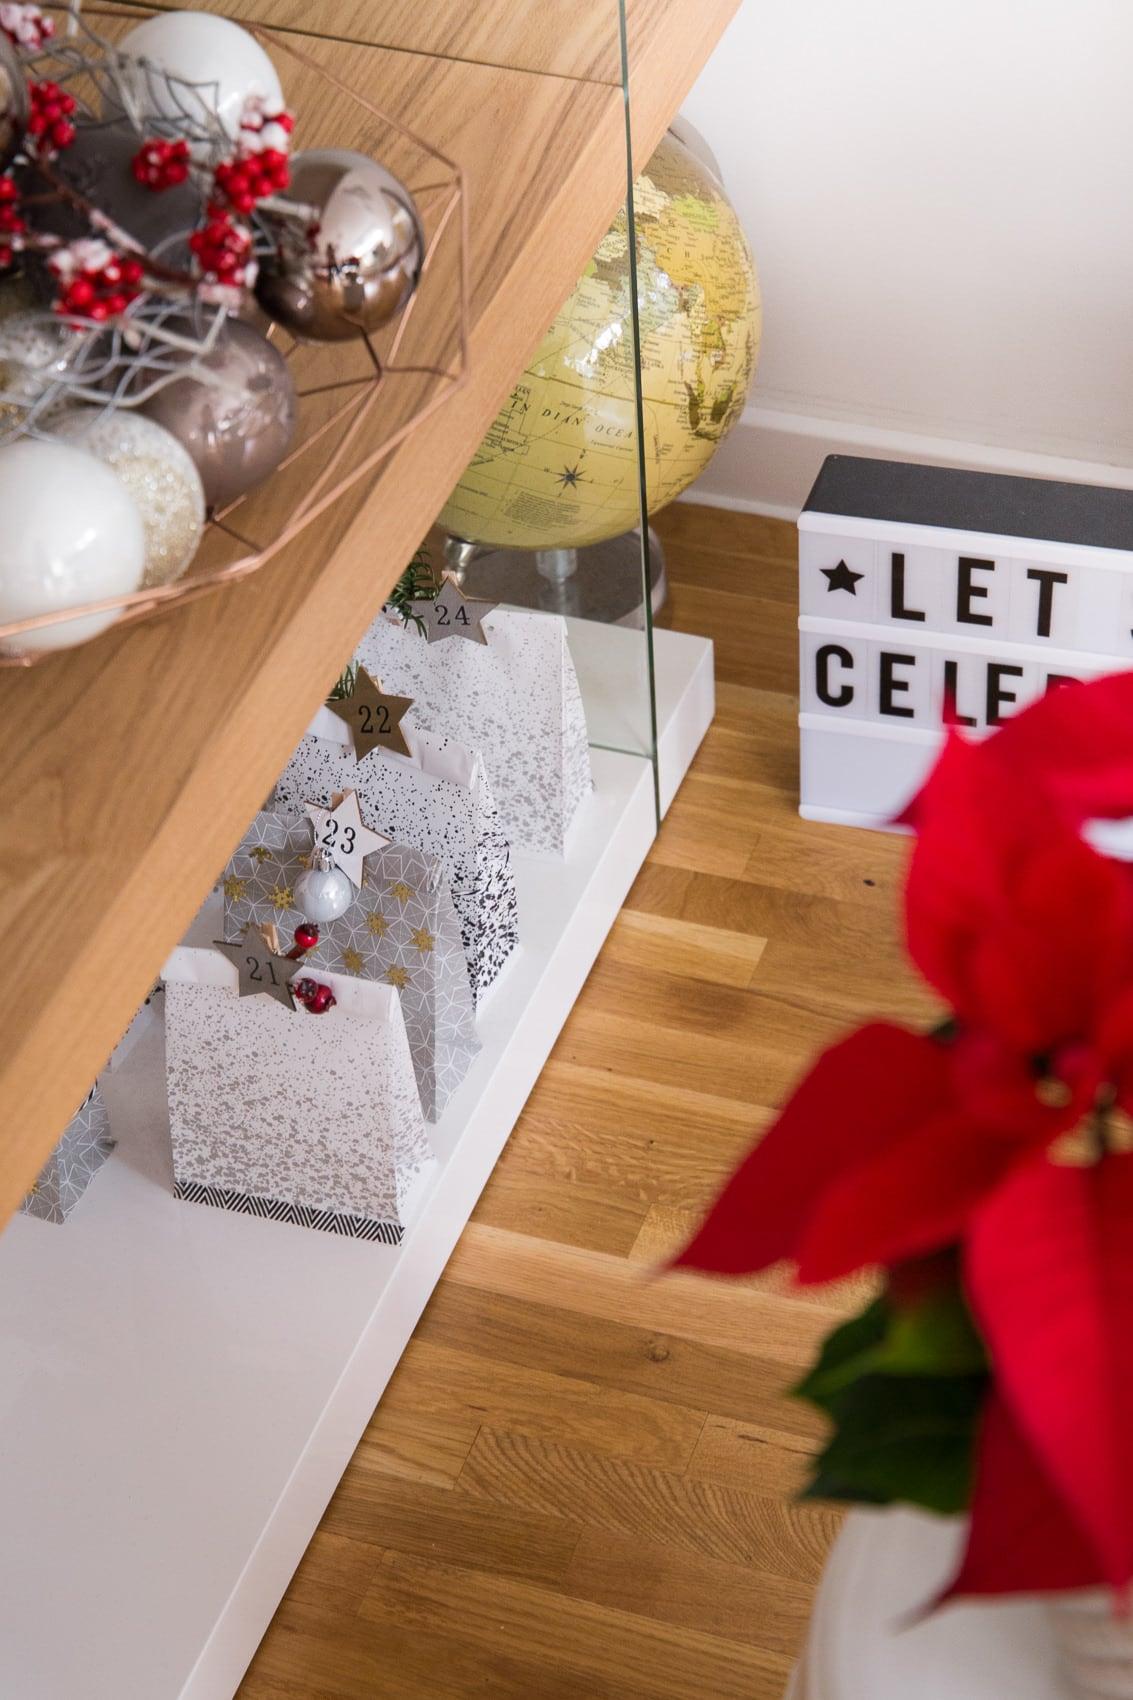 lastminute anleitung diy adventskalender f r sie und ihn. Black Bedroom Furniture Sets. Home Design Ideas